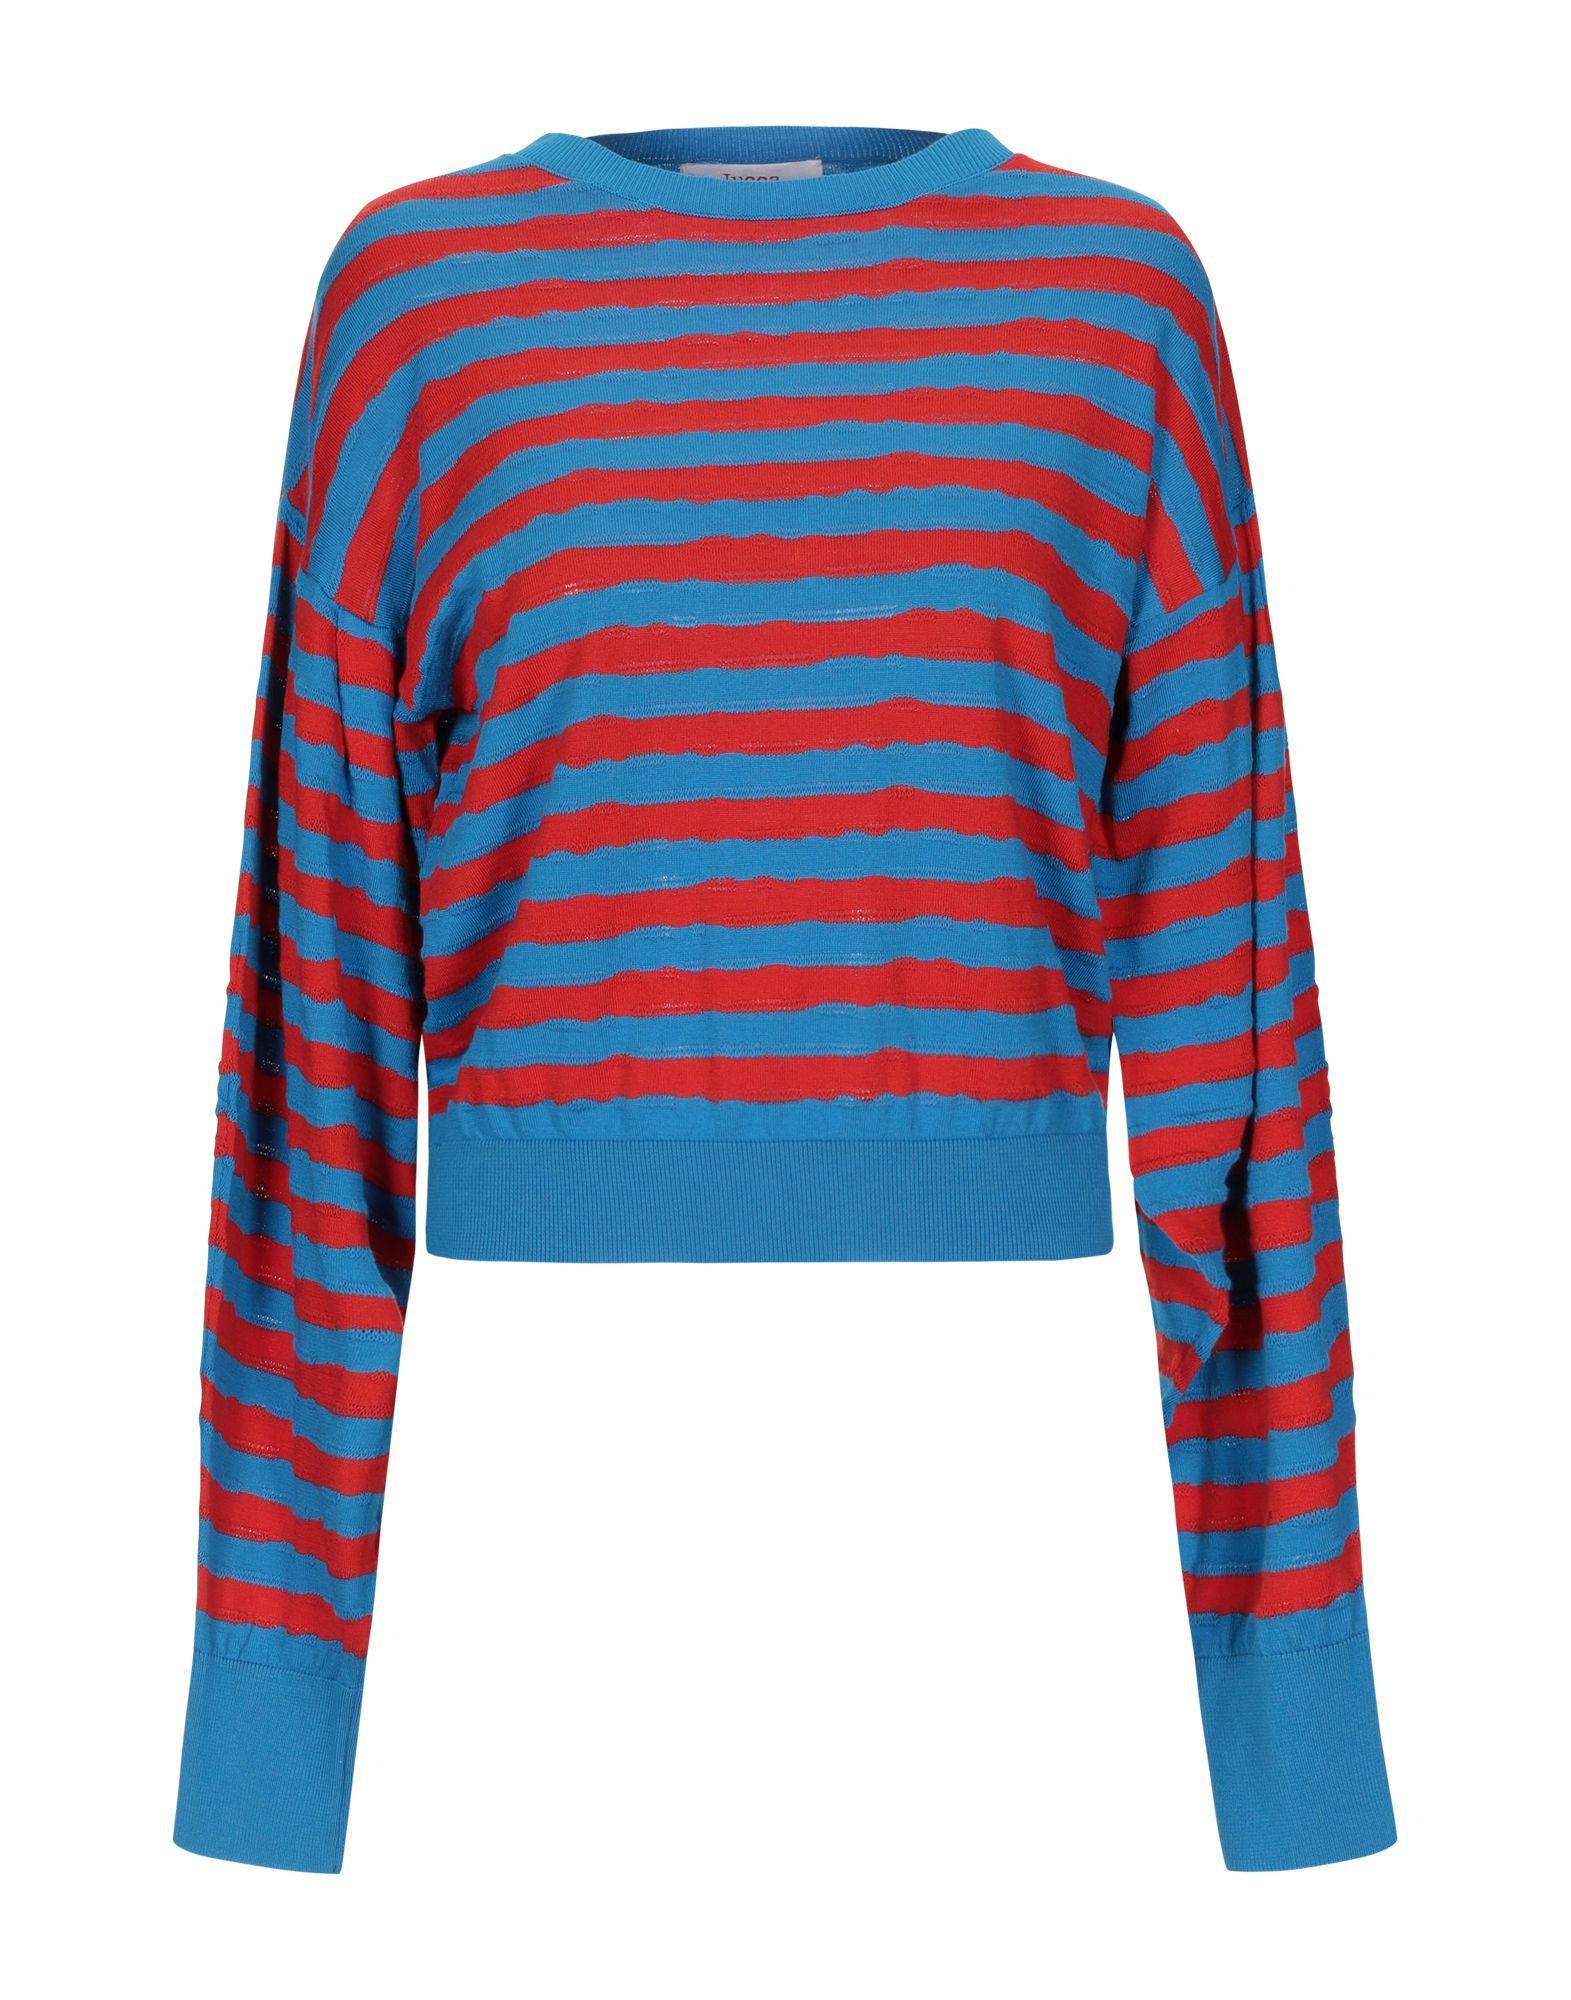 JUCCA Свитер свитер трикотажный женский